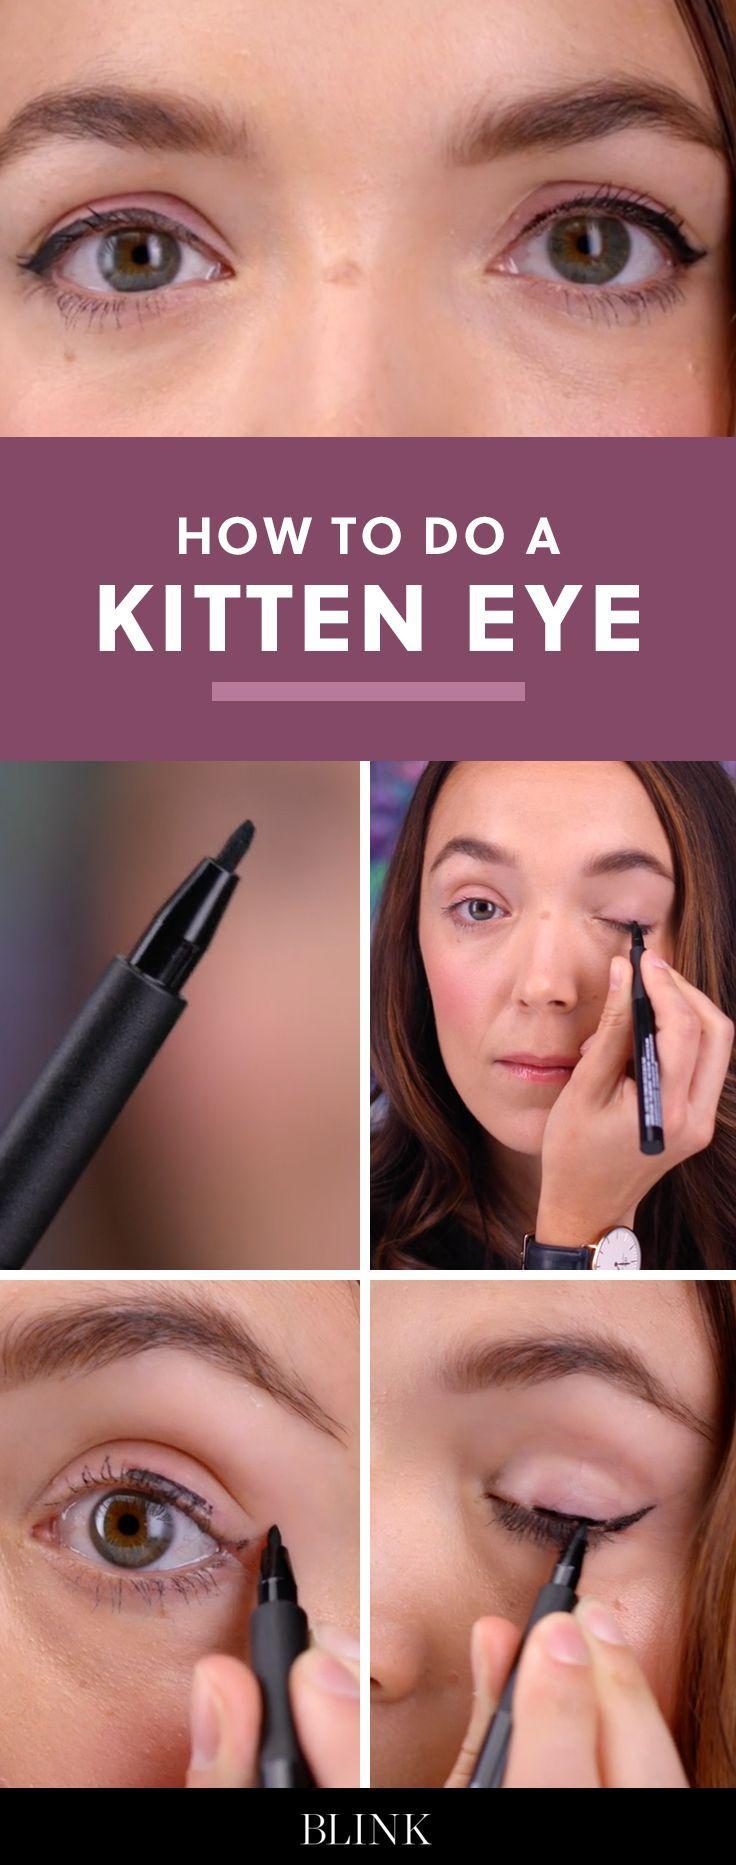 How to do a kitten eye blinkbeauty makeuptutorial cateye how to do a kitten eye blinkbeauty makeuptutorial cateye beautytutorial baditri Image collections